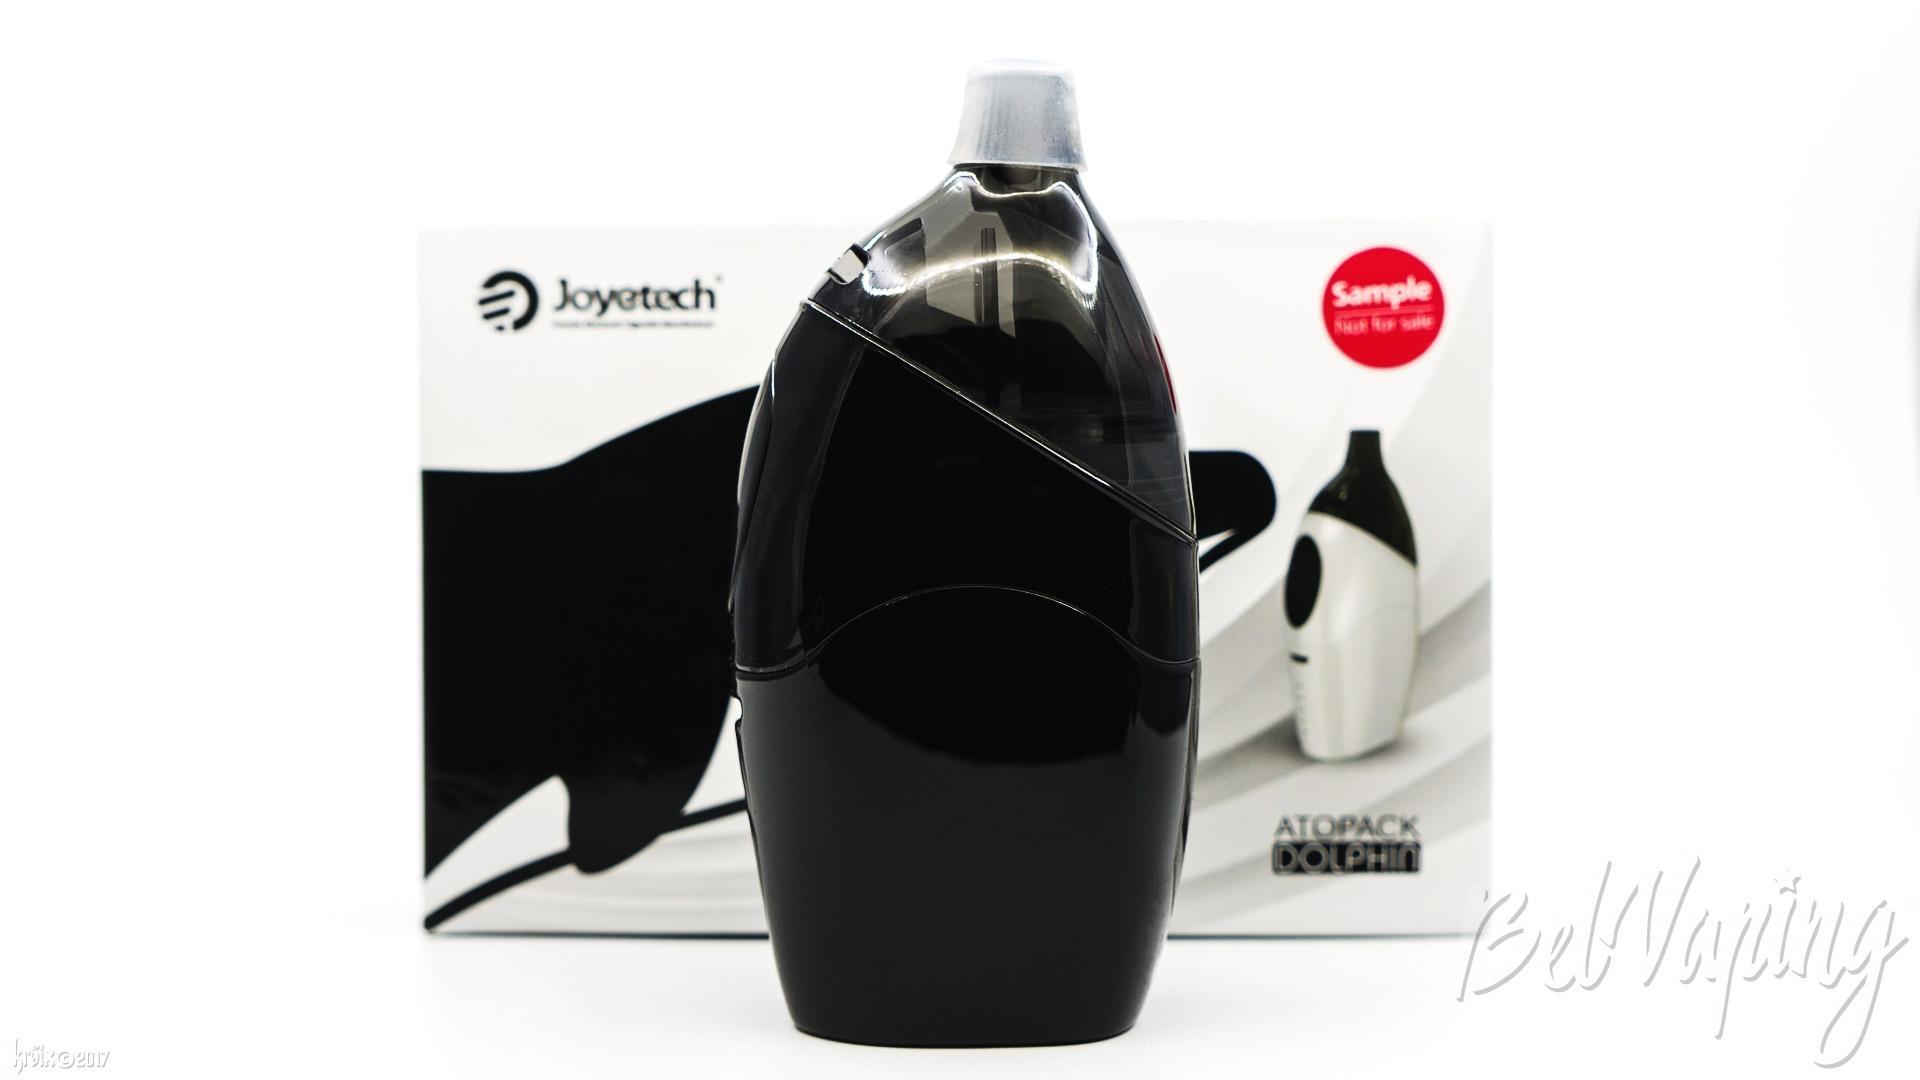 Обзор Atopack Dolphin от Joyetech